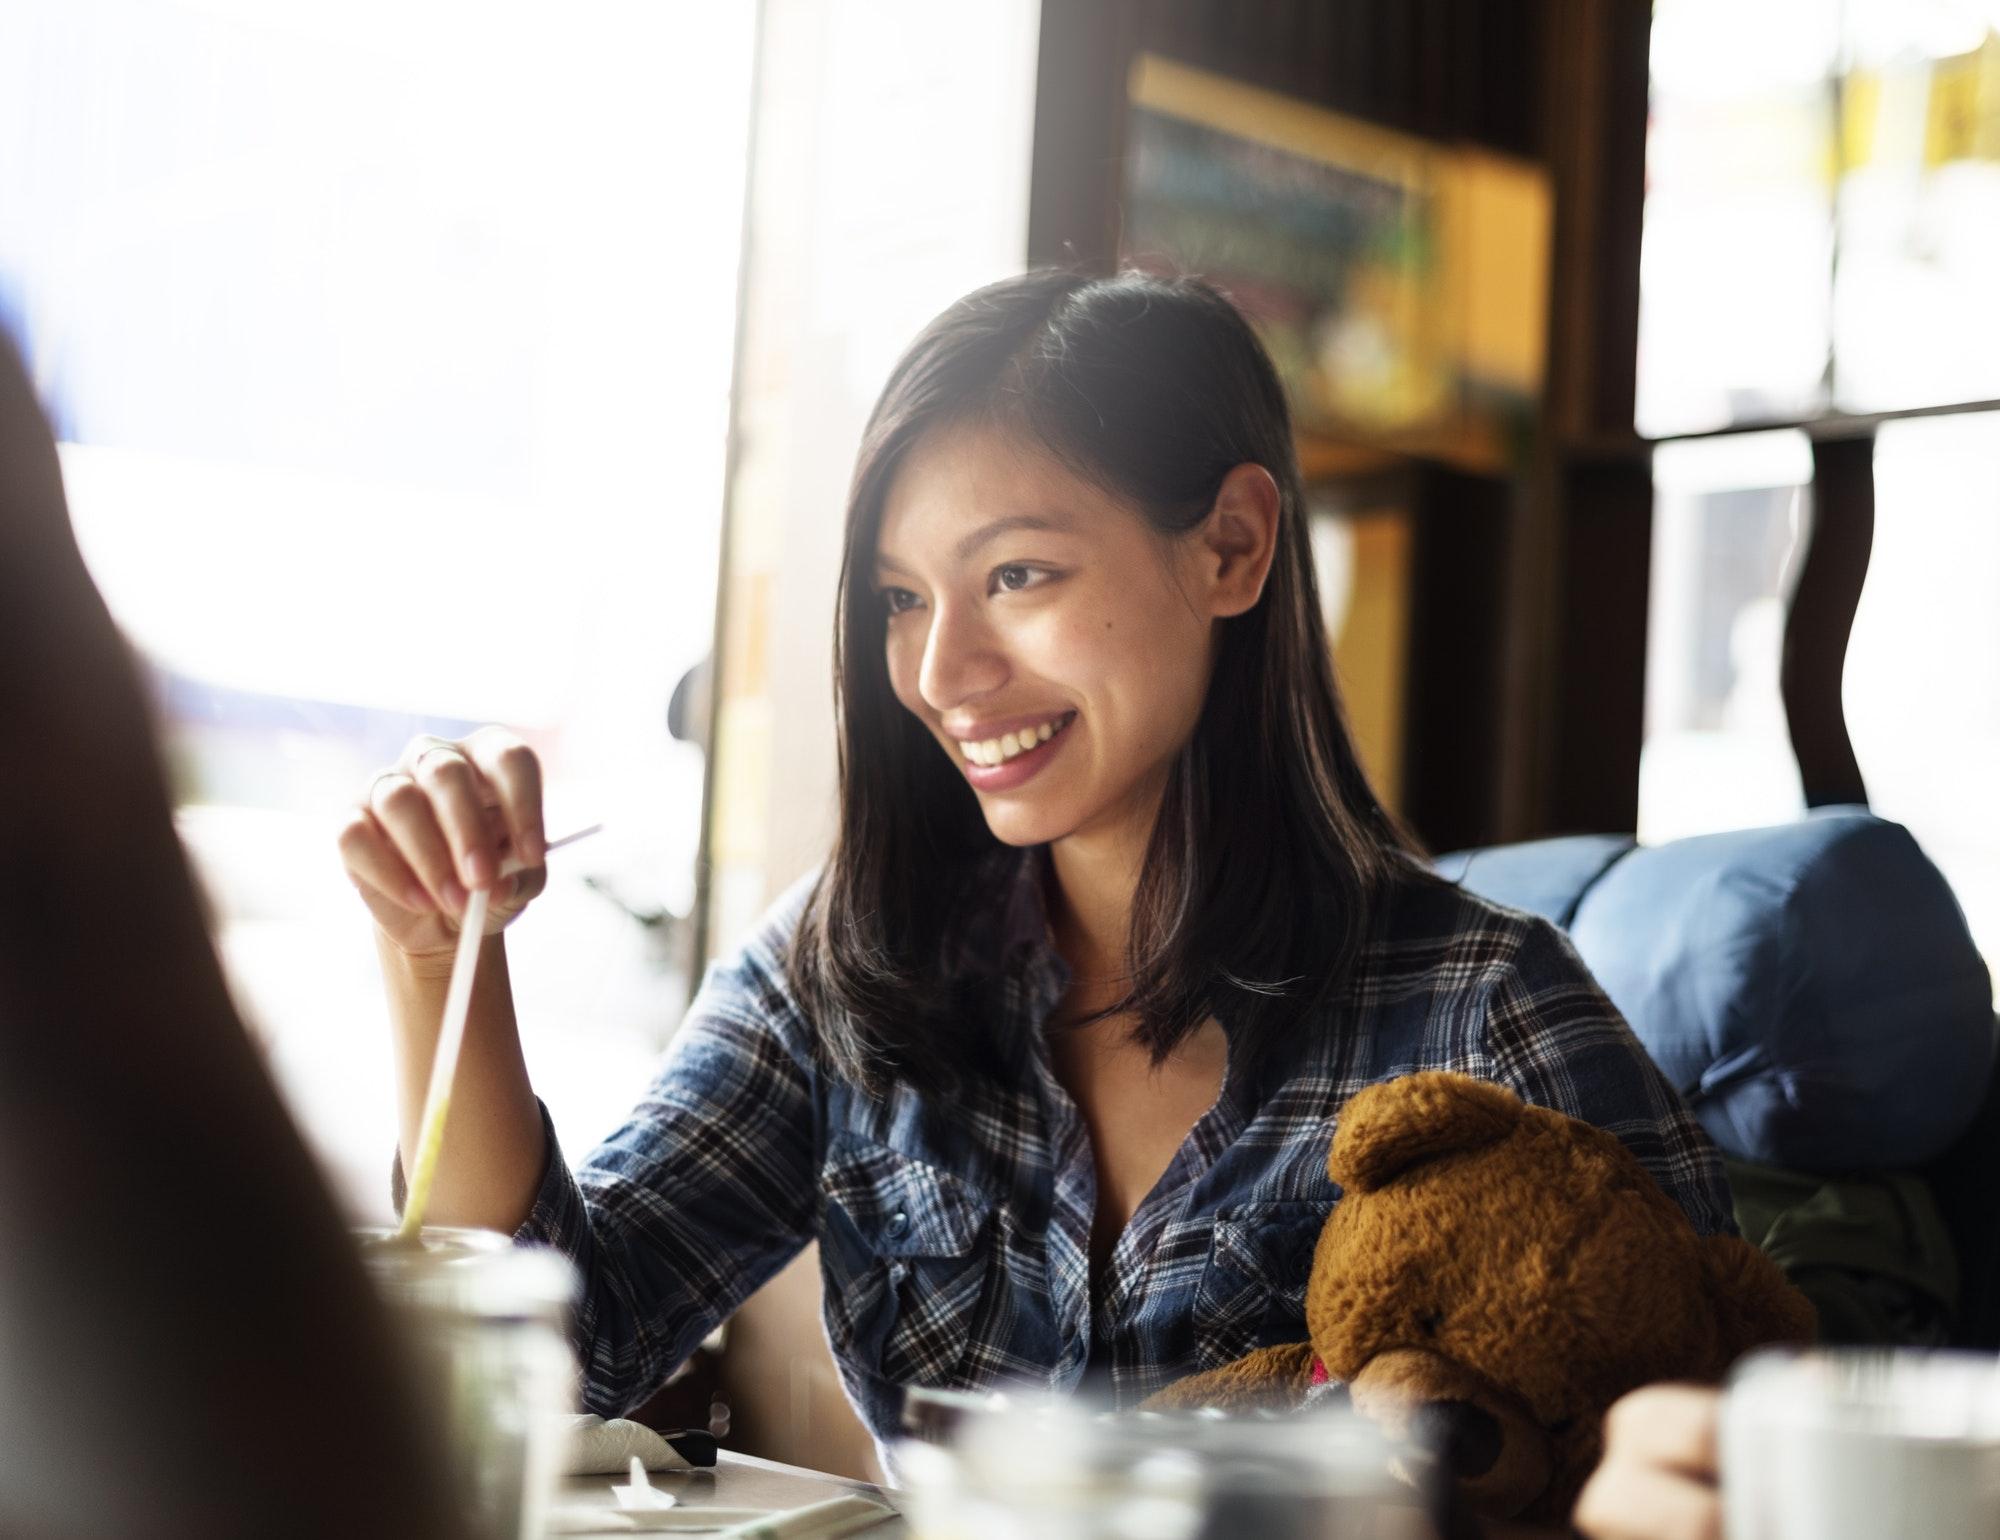 Girl Coffee Shop Drinking Beverage Cafe Restaurant Concept